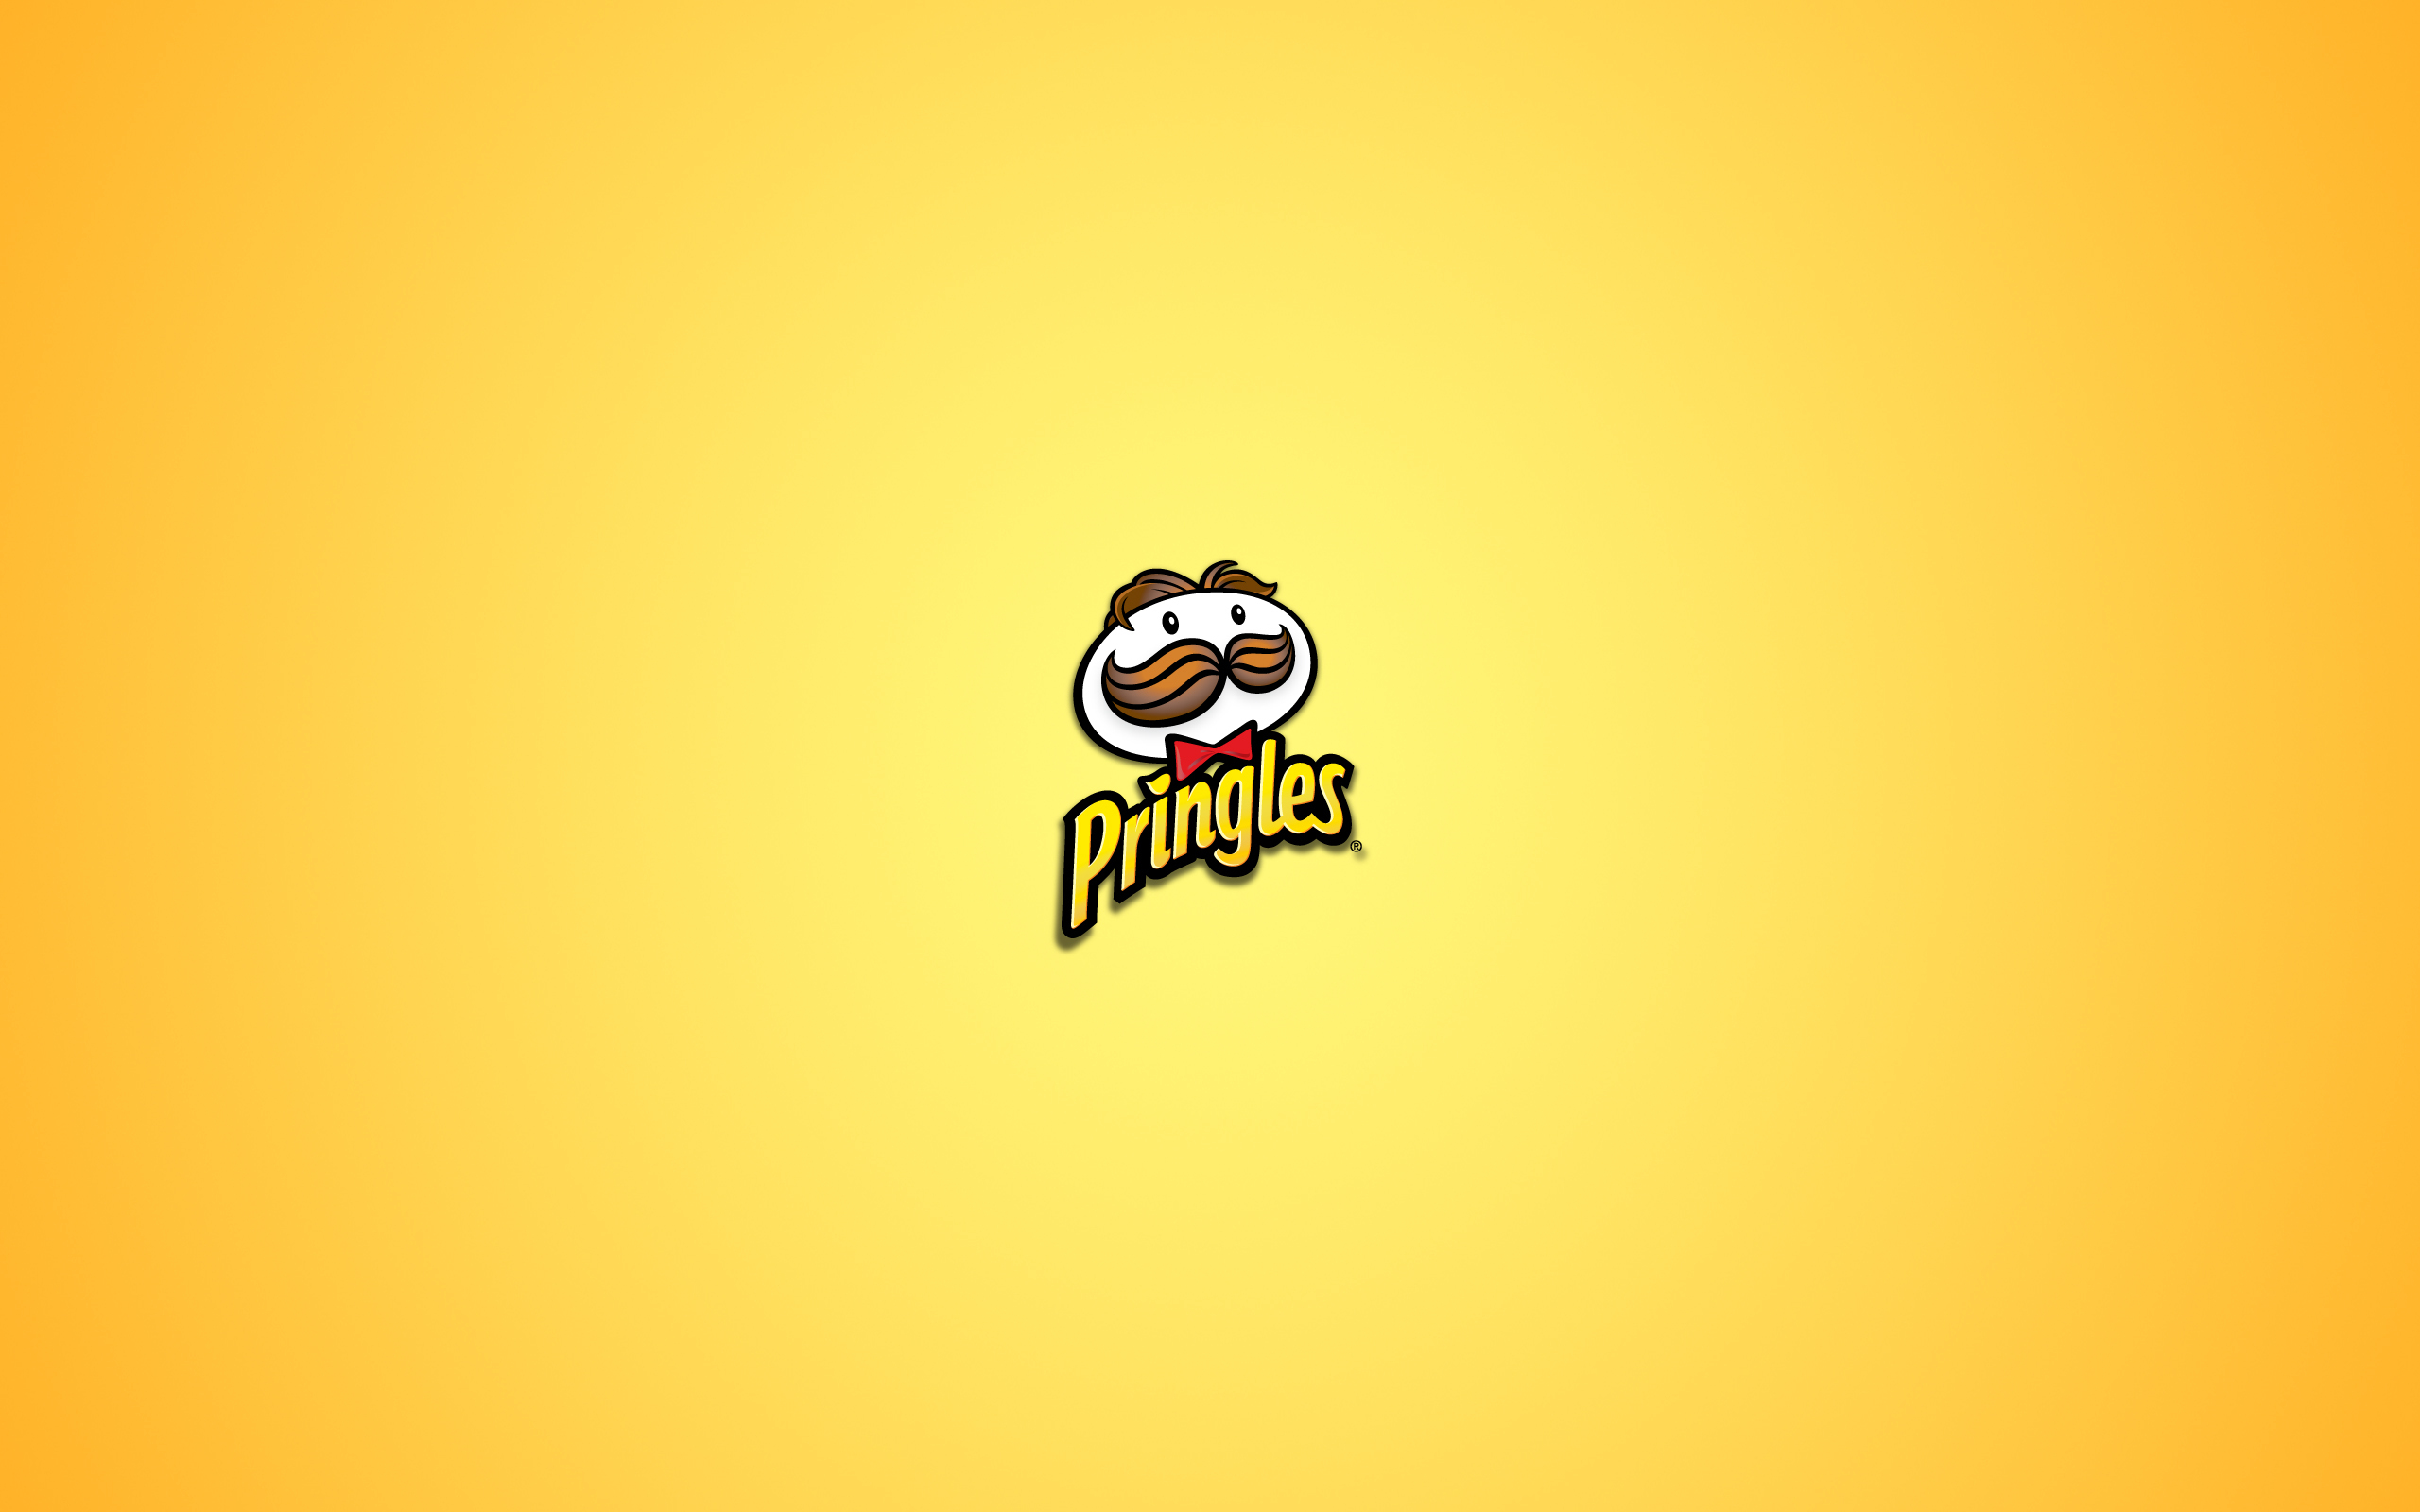 Pringles wallpaper 2560x1600 27805 2560x1600